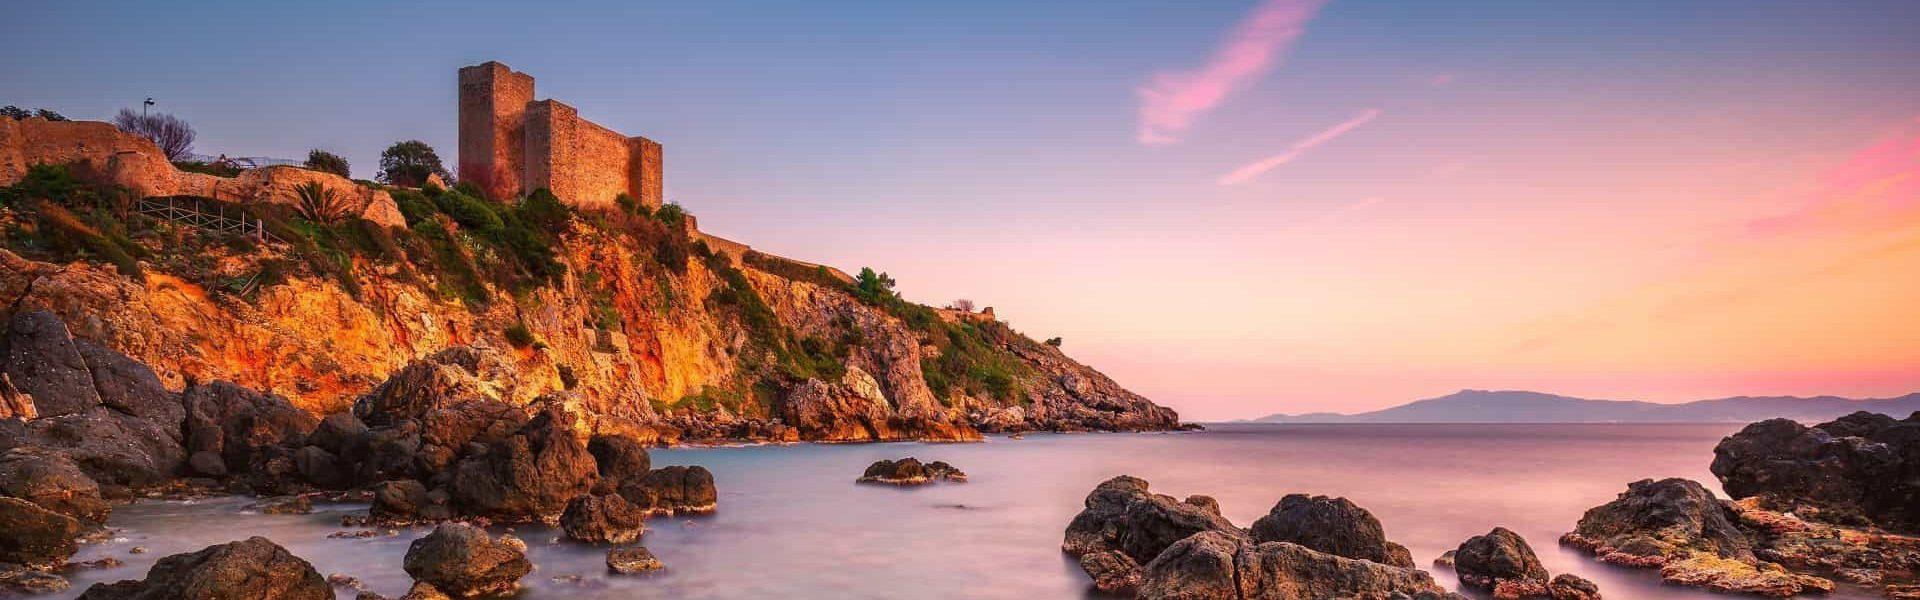 Talamone rock beach medieval fortress  sunset. Maremma Argentario, Tuscany, Italy